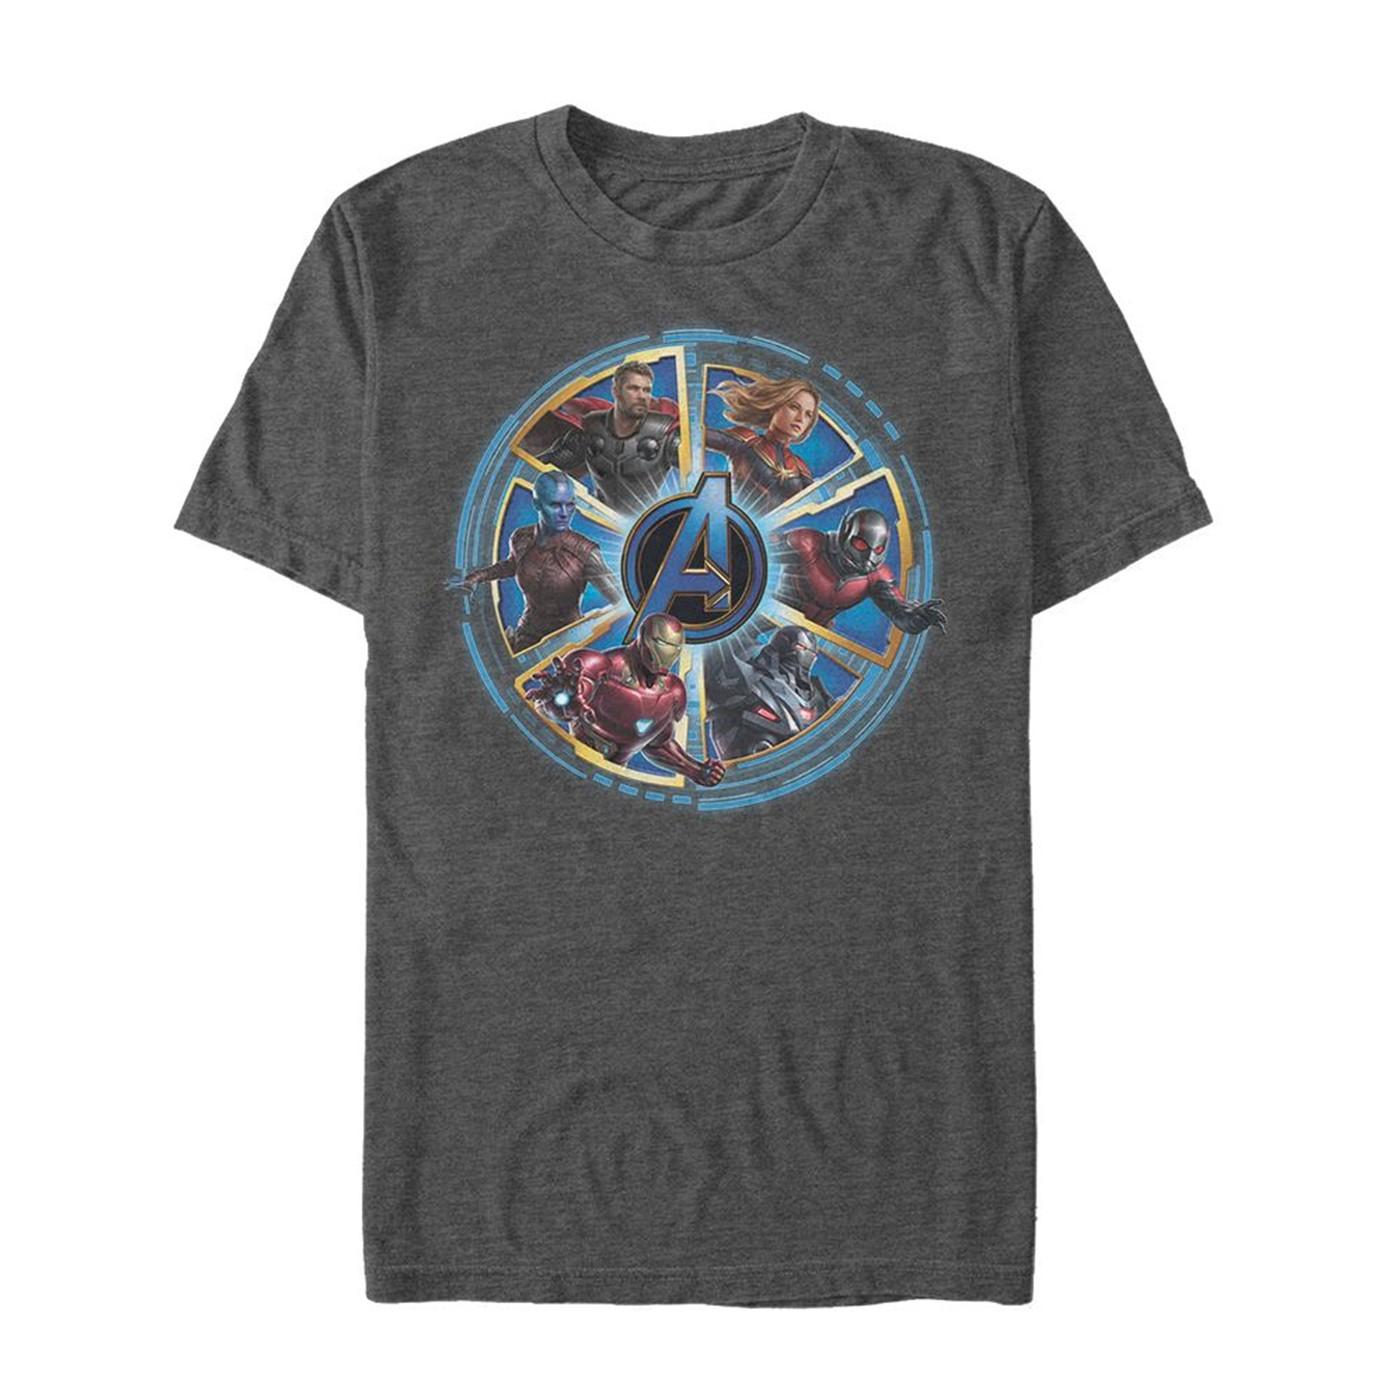 Avengers Endgame Circle Heroes Men's T-Shirt